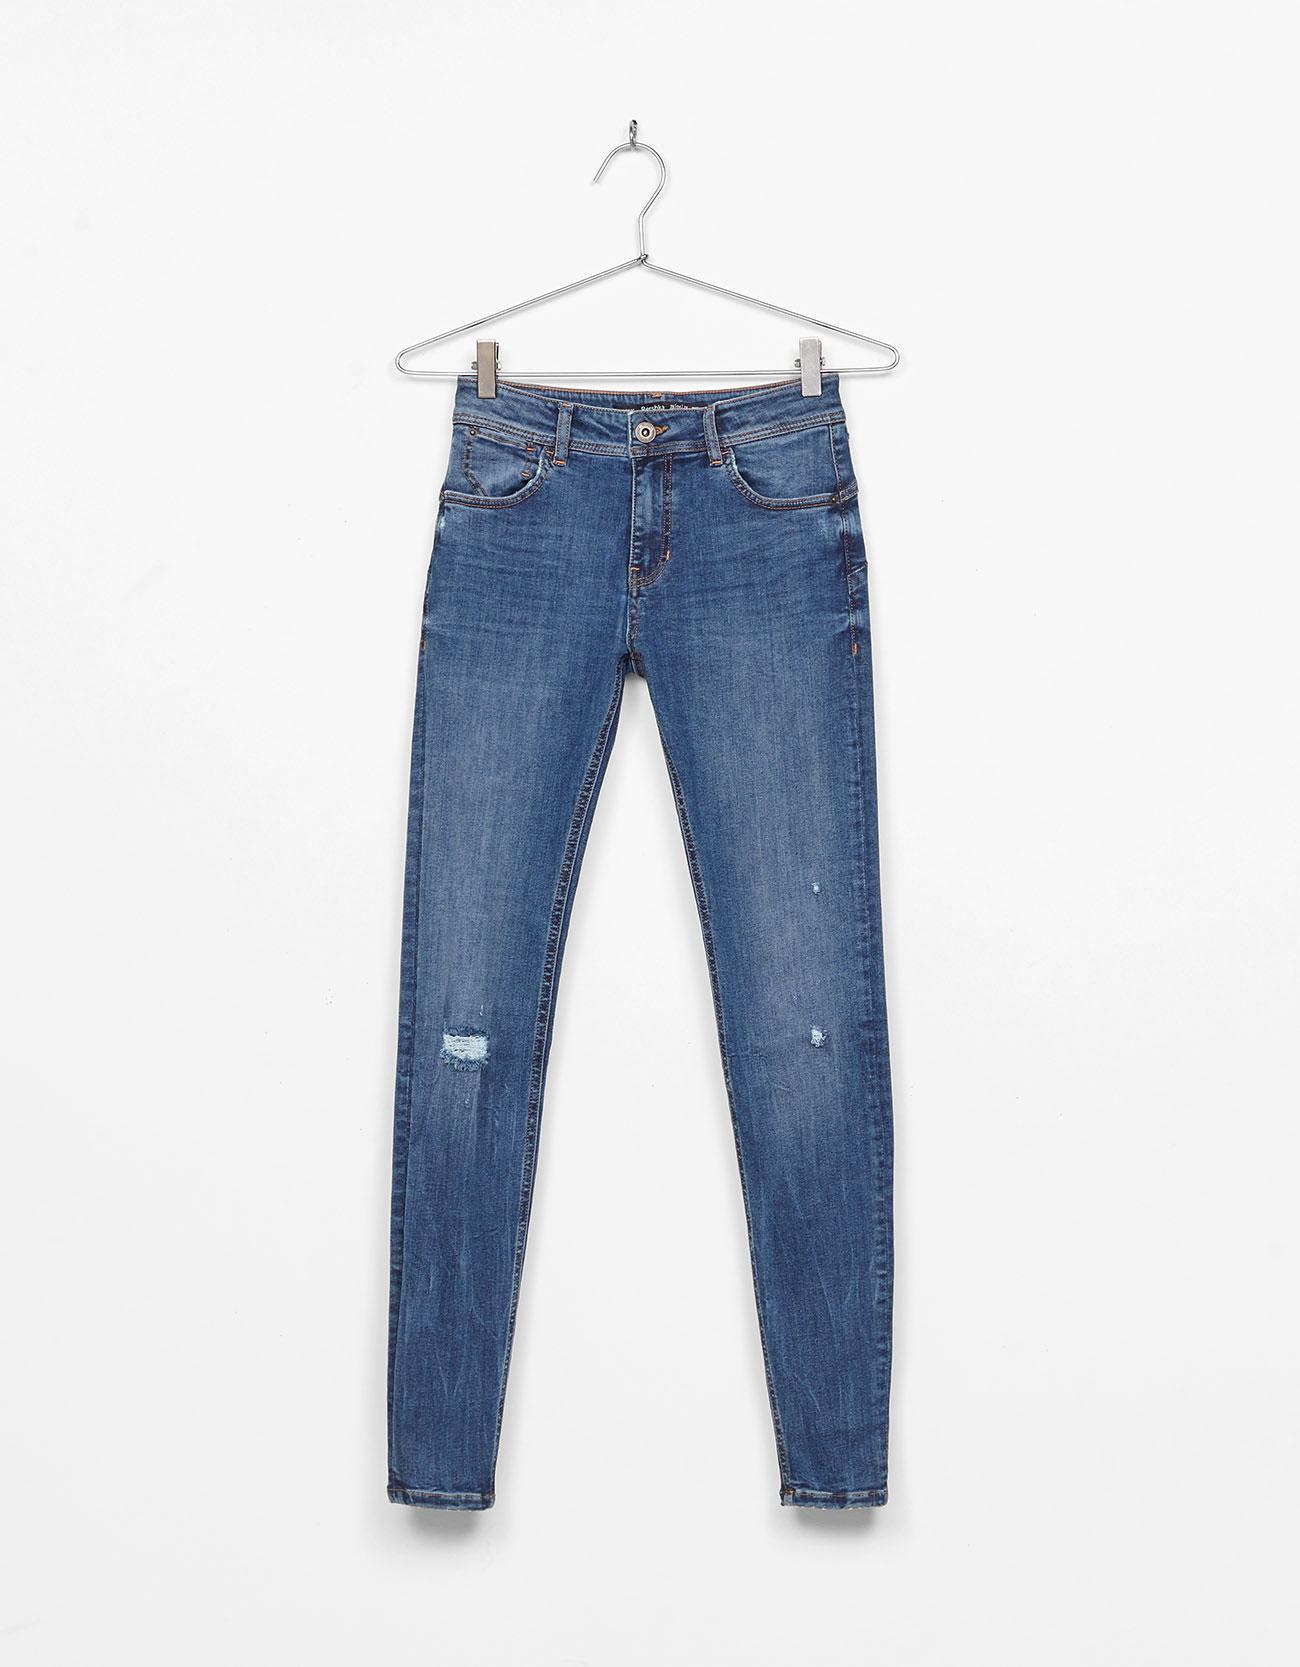 Ripped Push-up Jeans - Jeans - Bershka Ireland